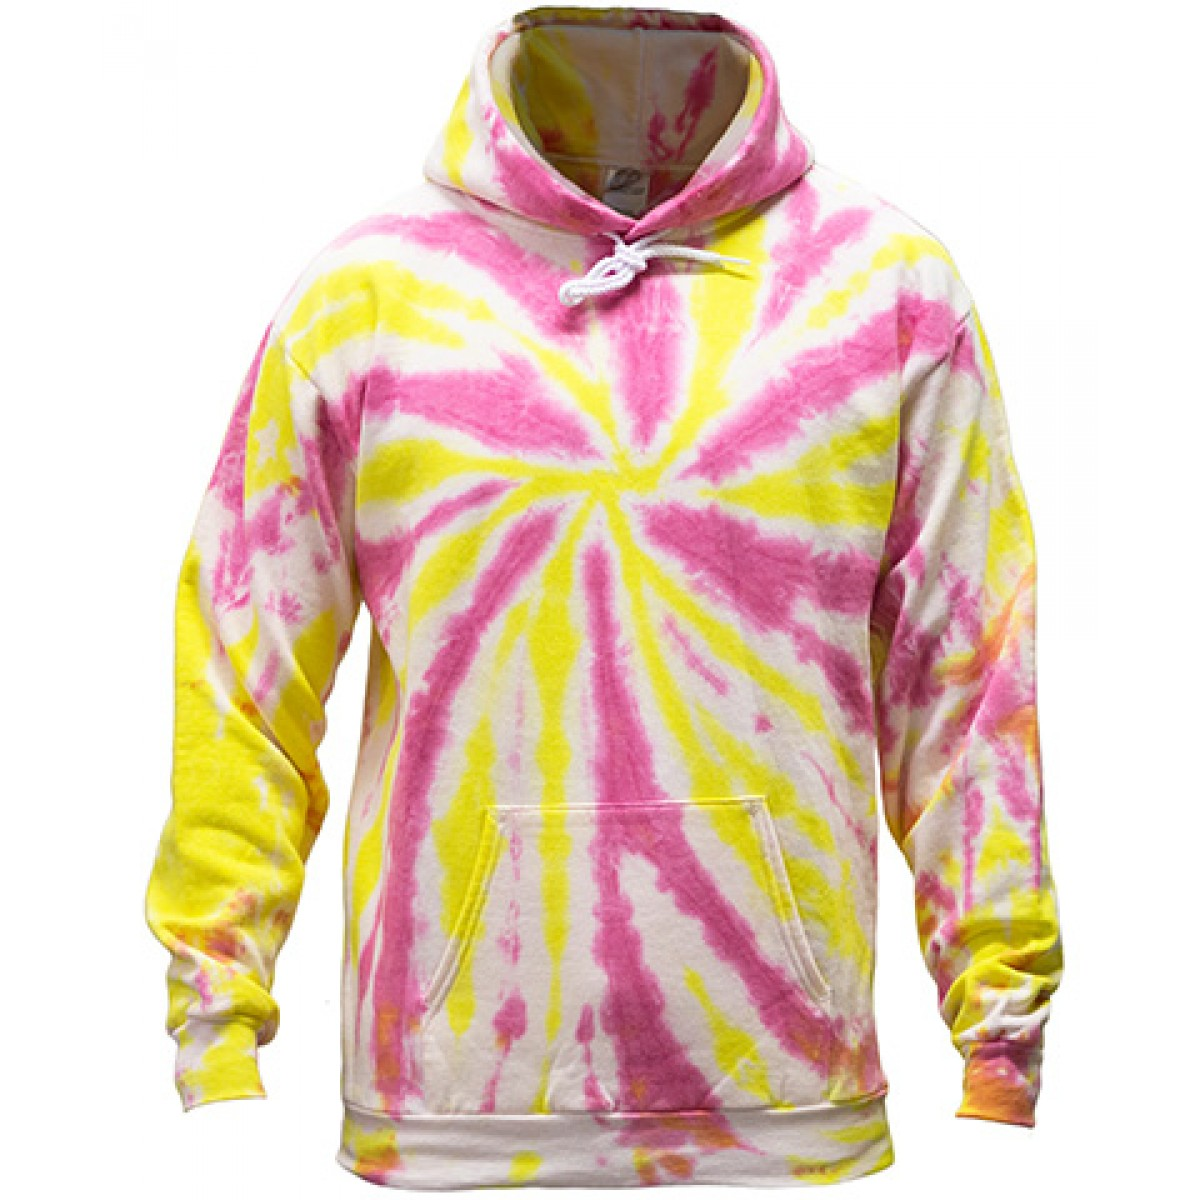 Tie-Dye Pullover Hooded Sweatshirt-Pink/Yellow-YL